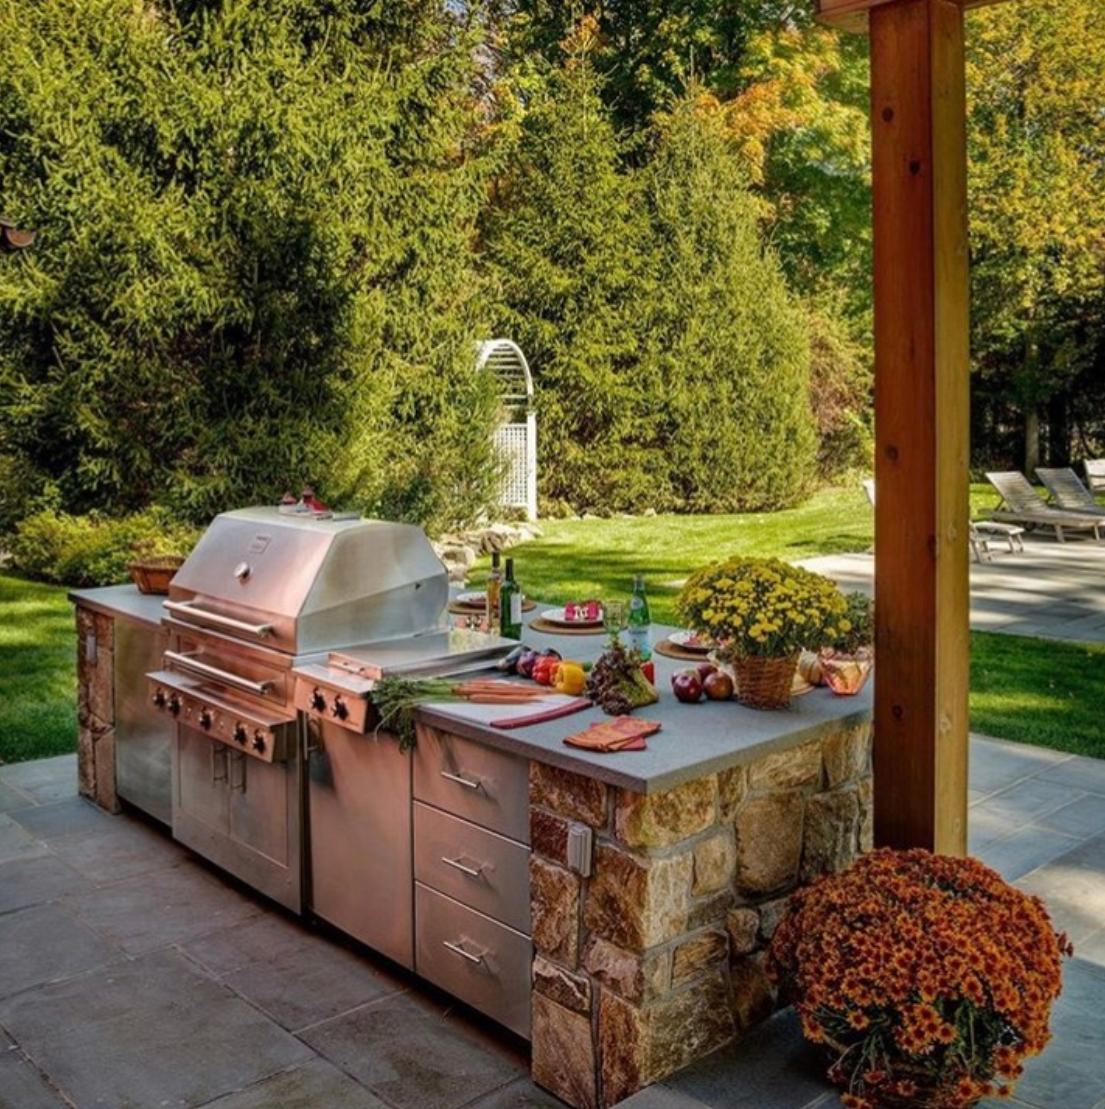 Backyard Goals Outdoor Appliances Grill Design Outdoor Kitchen